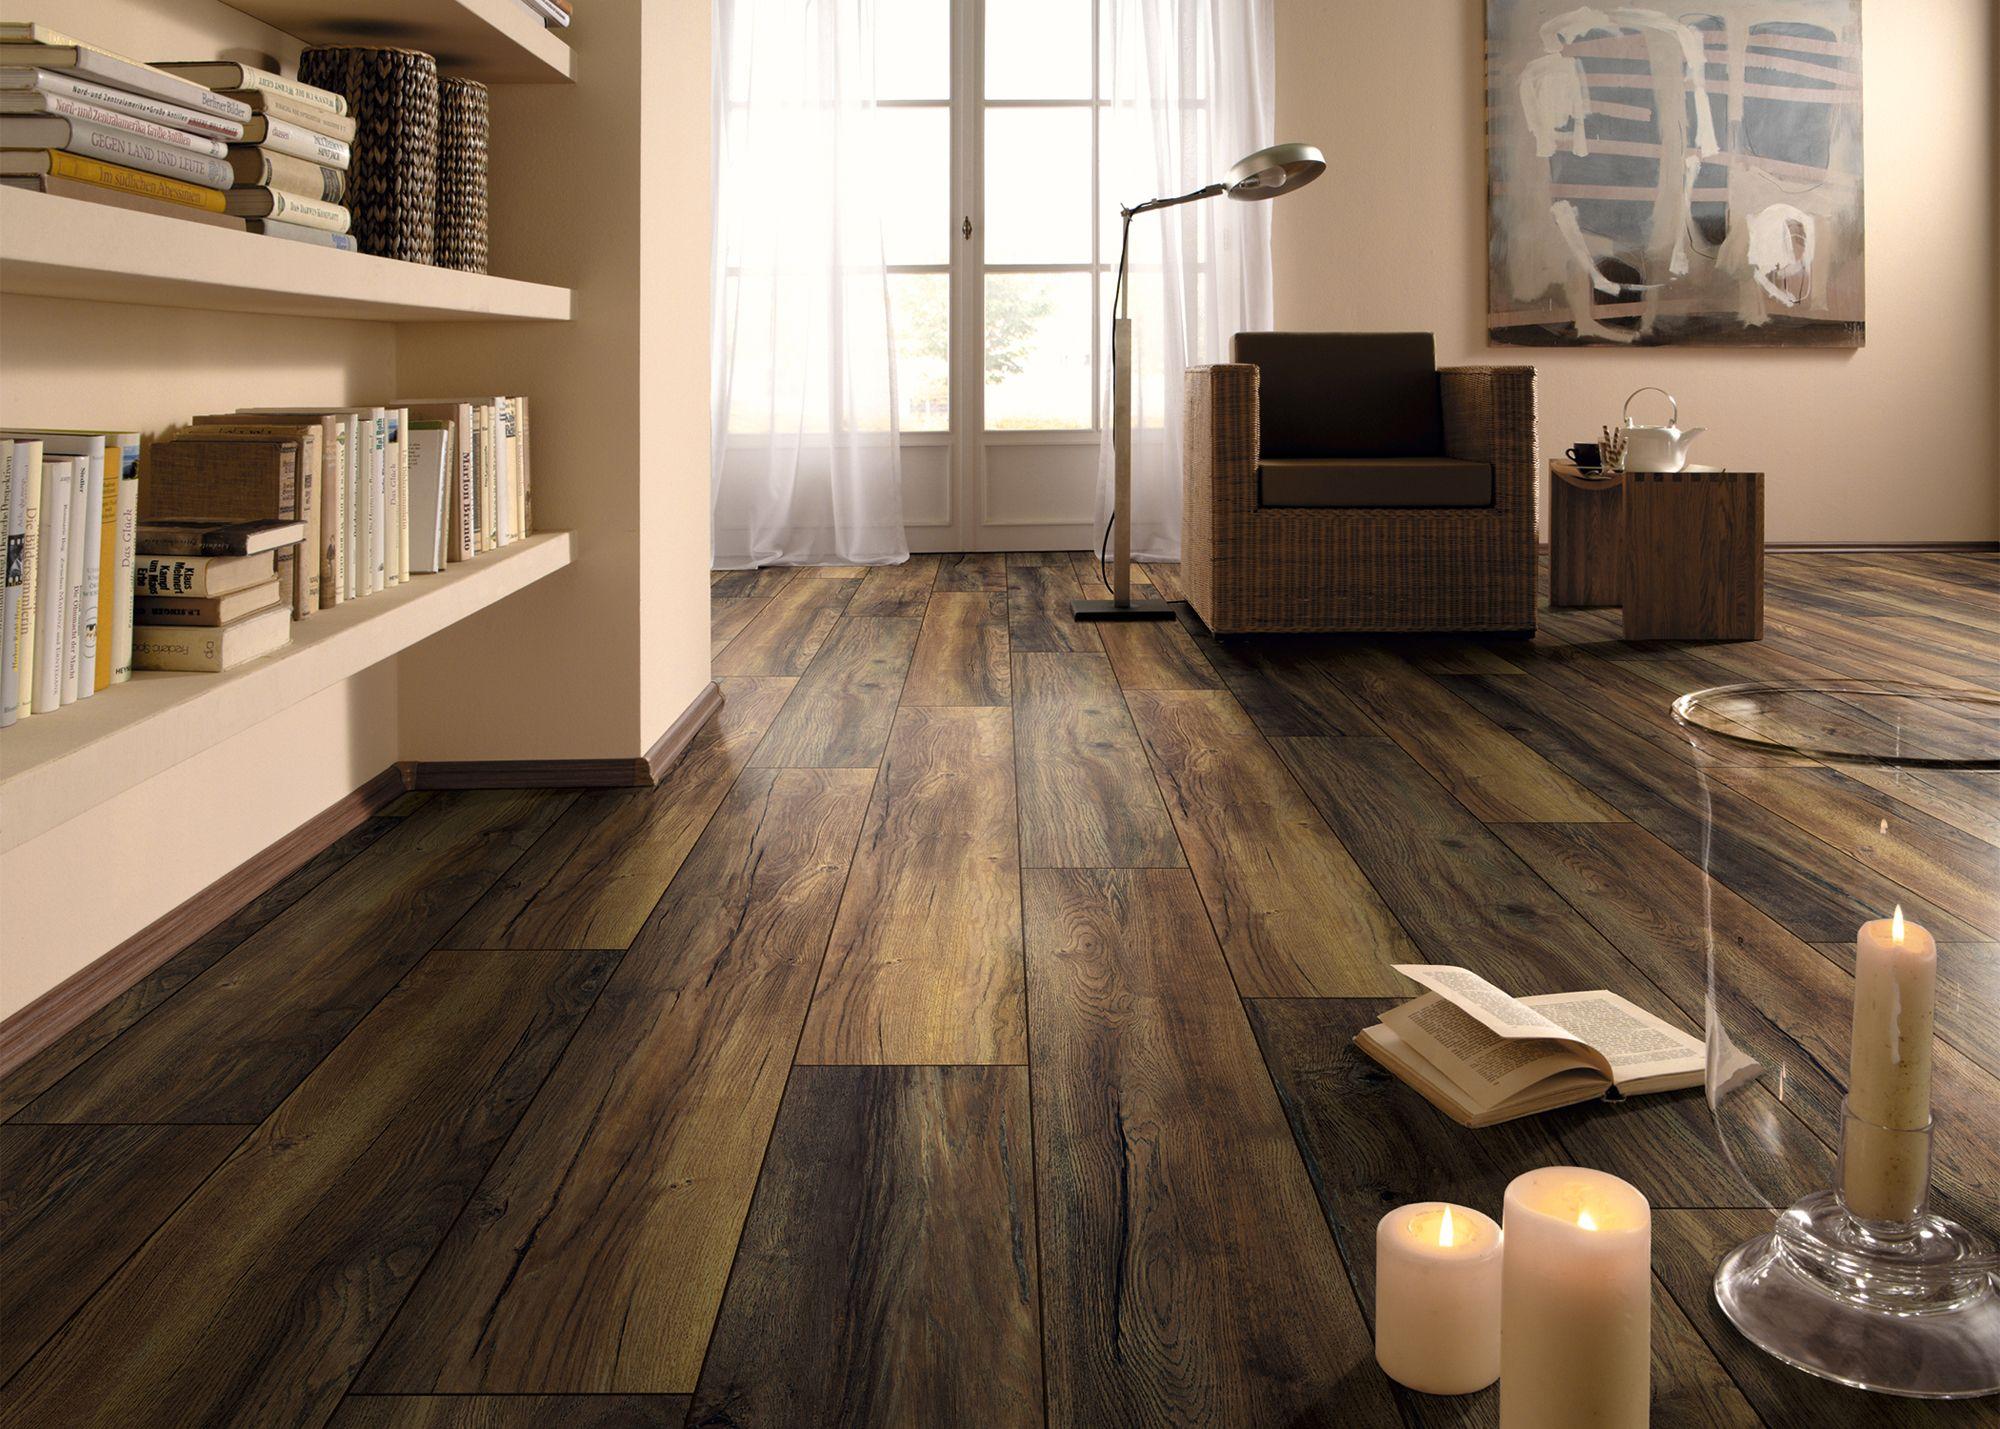 New Haven Harbor Oak - a Dream Home Laminate | Floors: Laminate ...